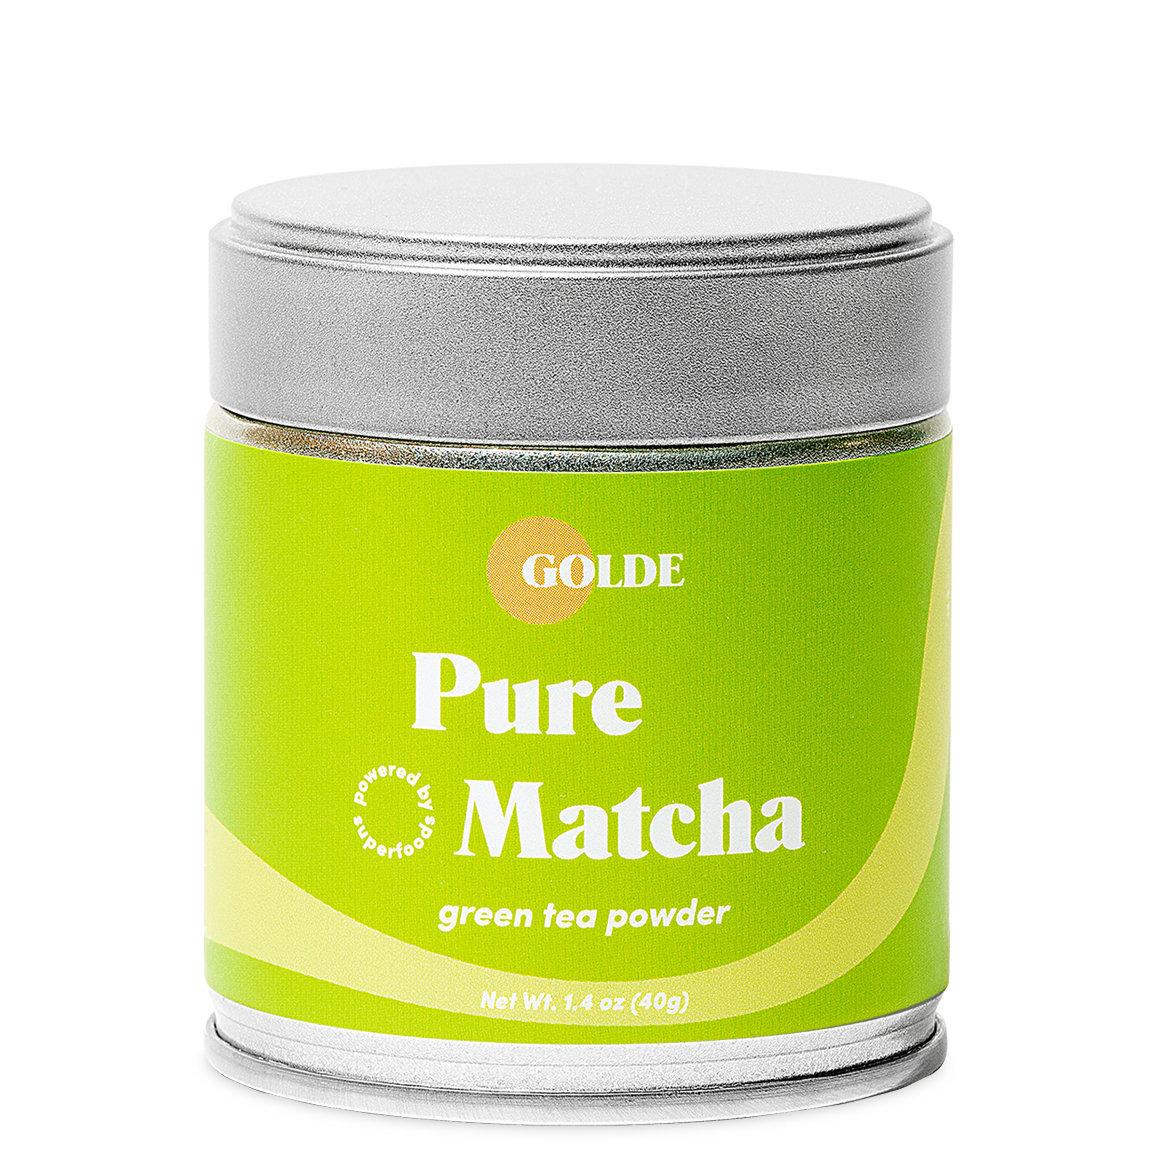 Golde Pure Matcha alternative view 1 - product swatch.